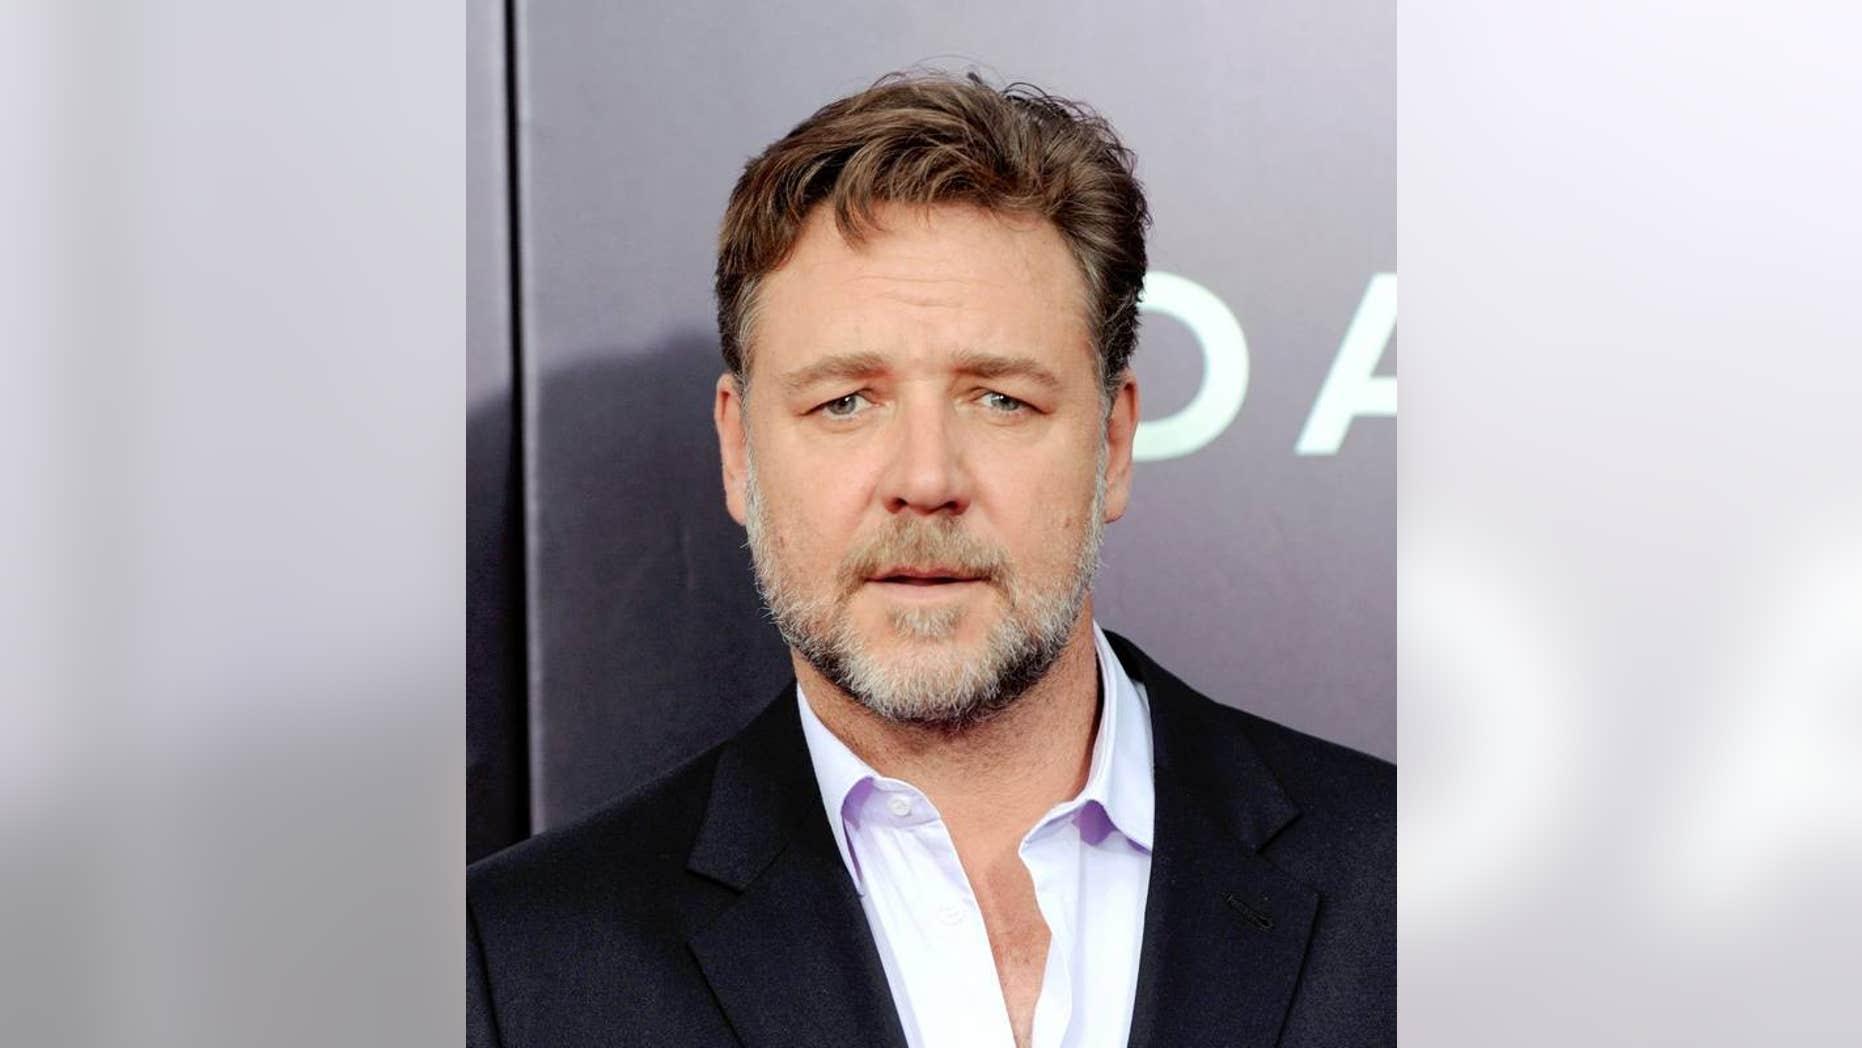 Russell Crowe has bone to pick with Virgin Australia.